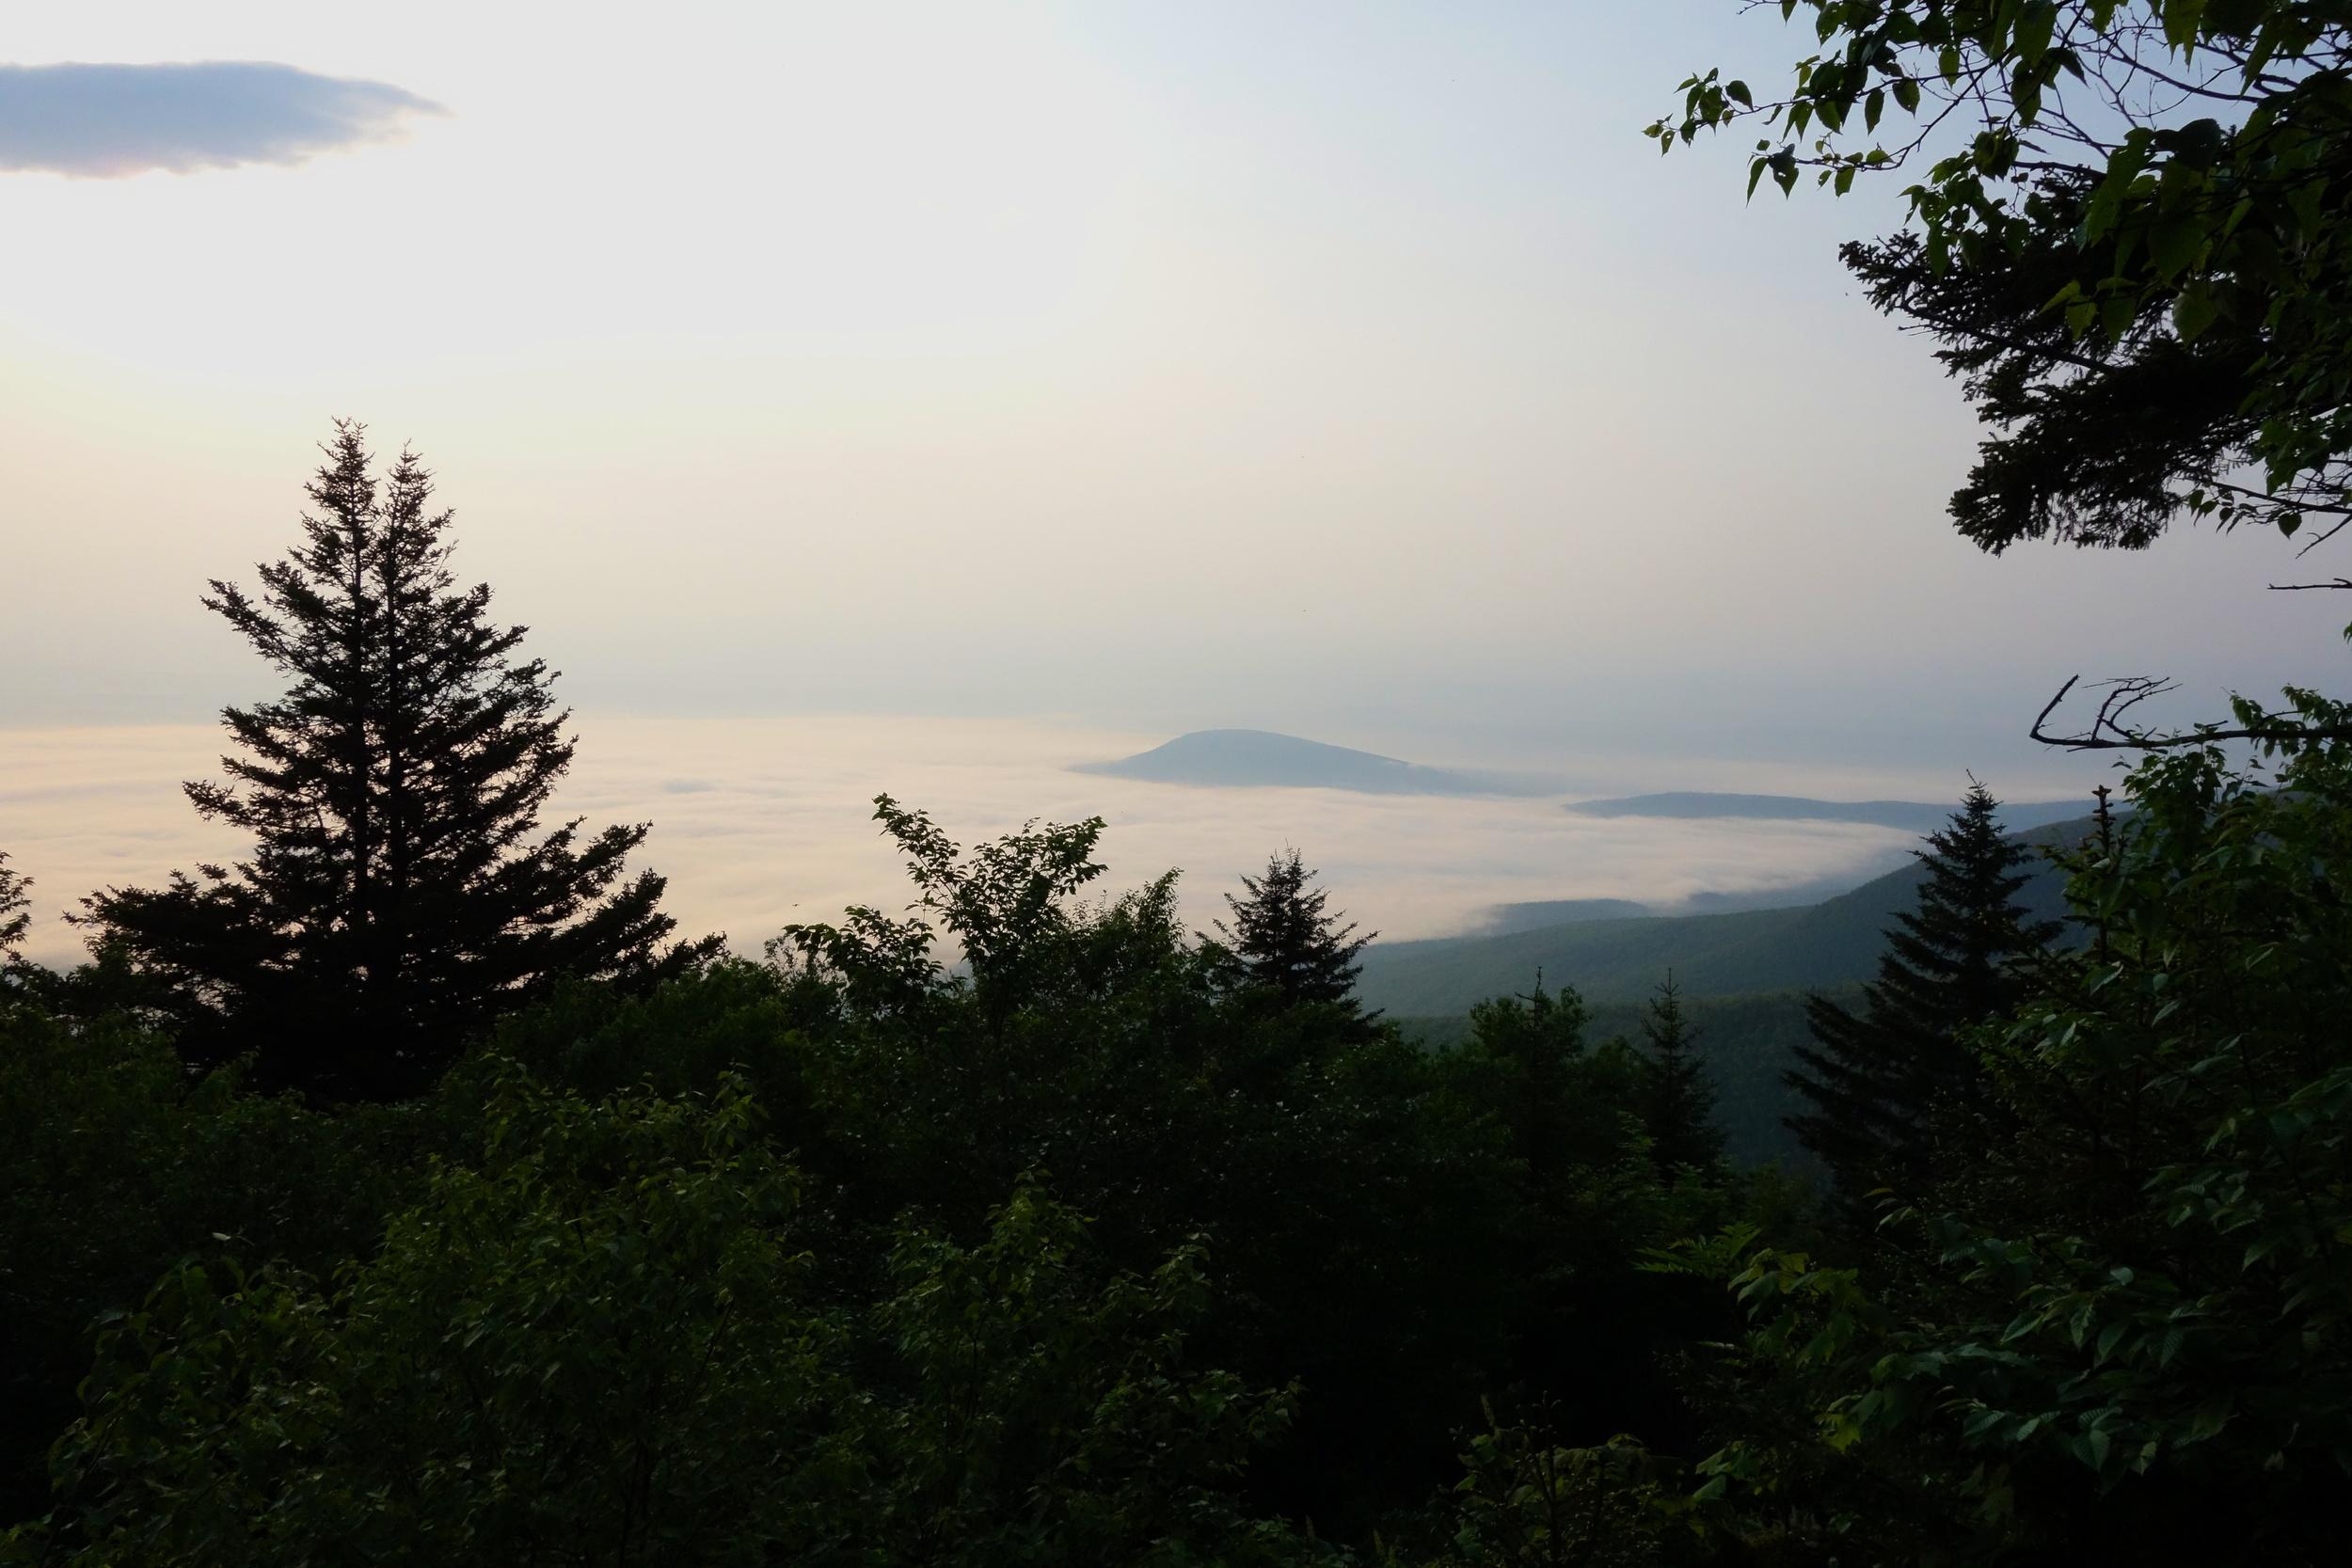 Close to the top of Blackhead Mountain